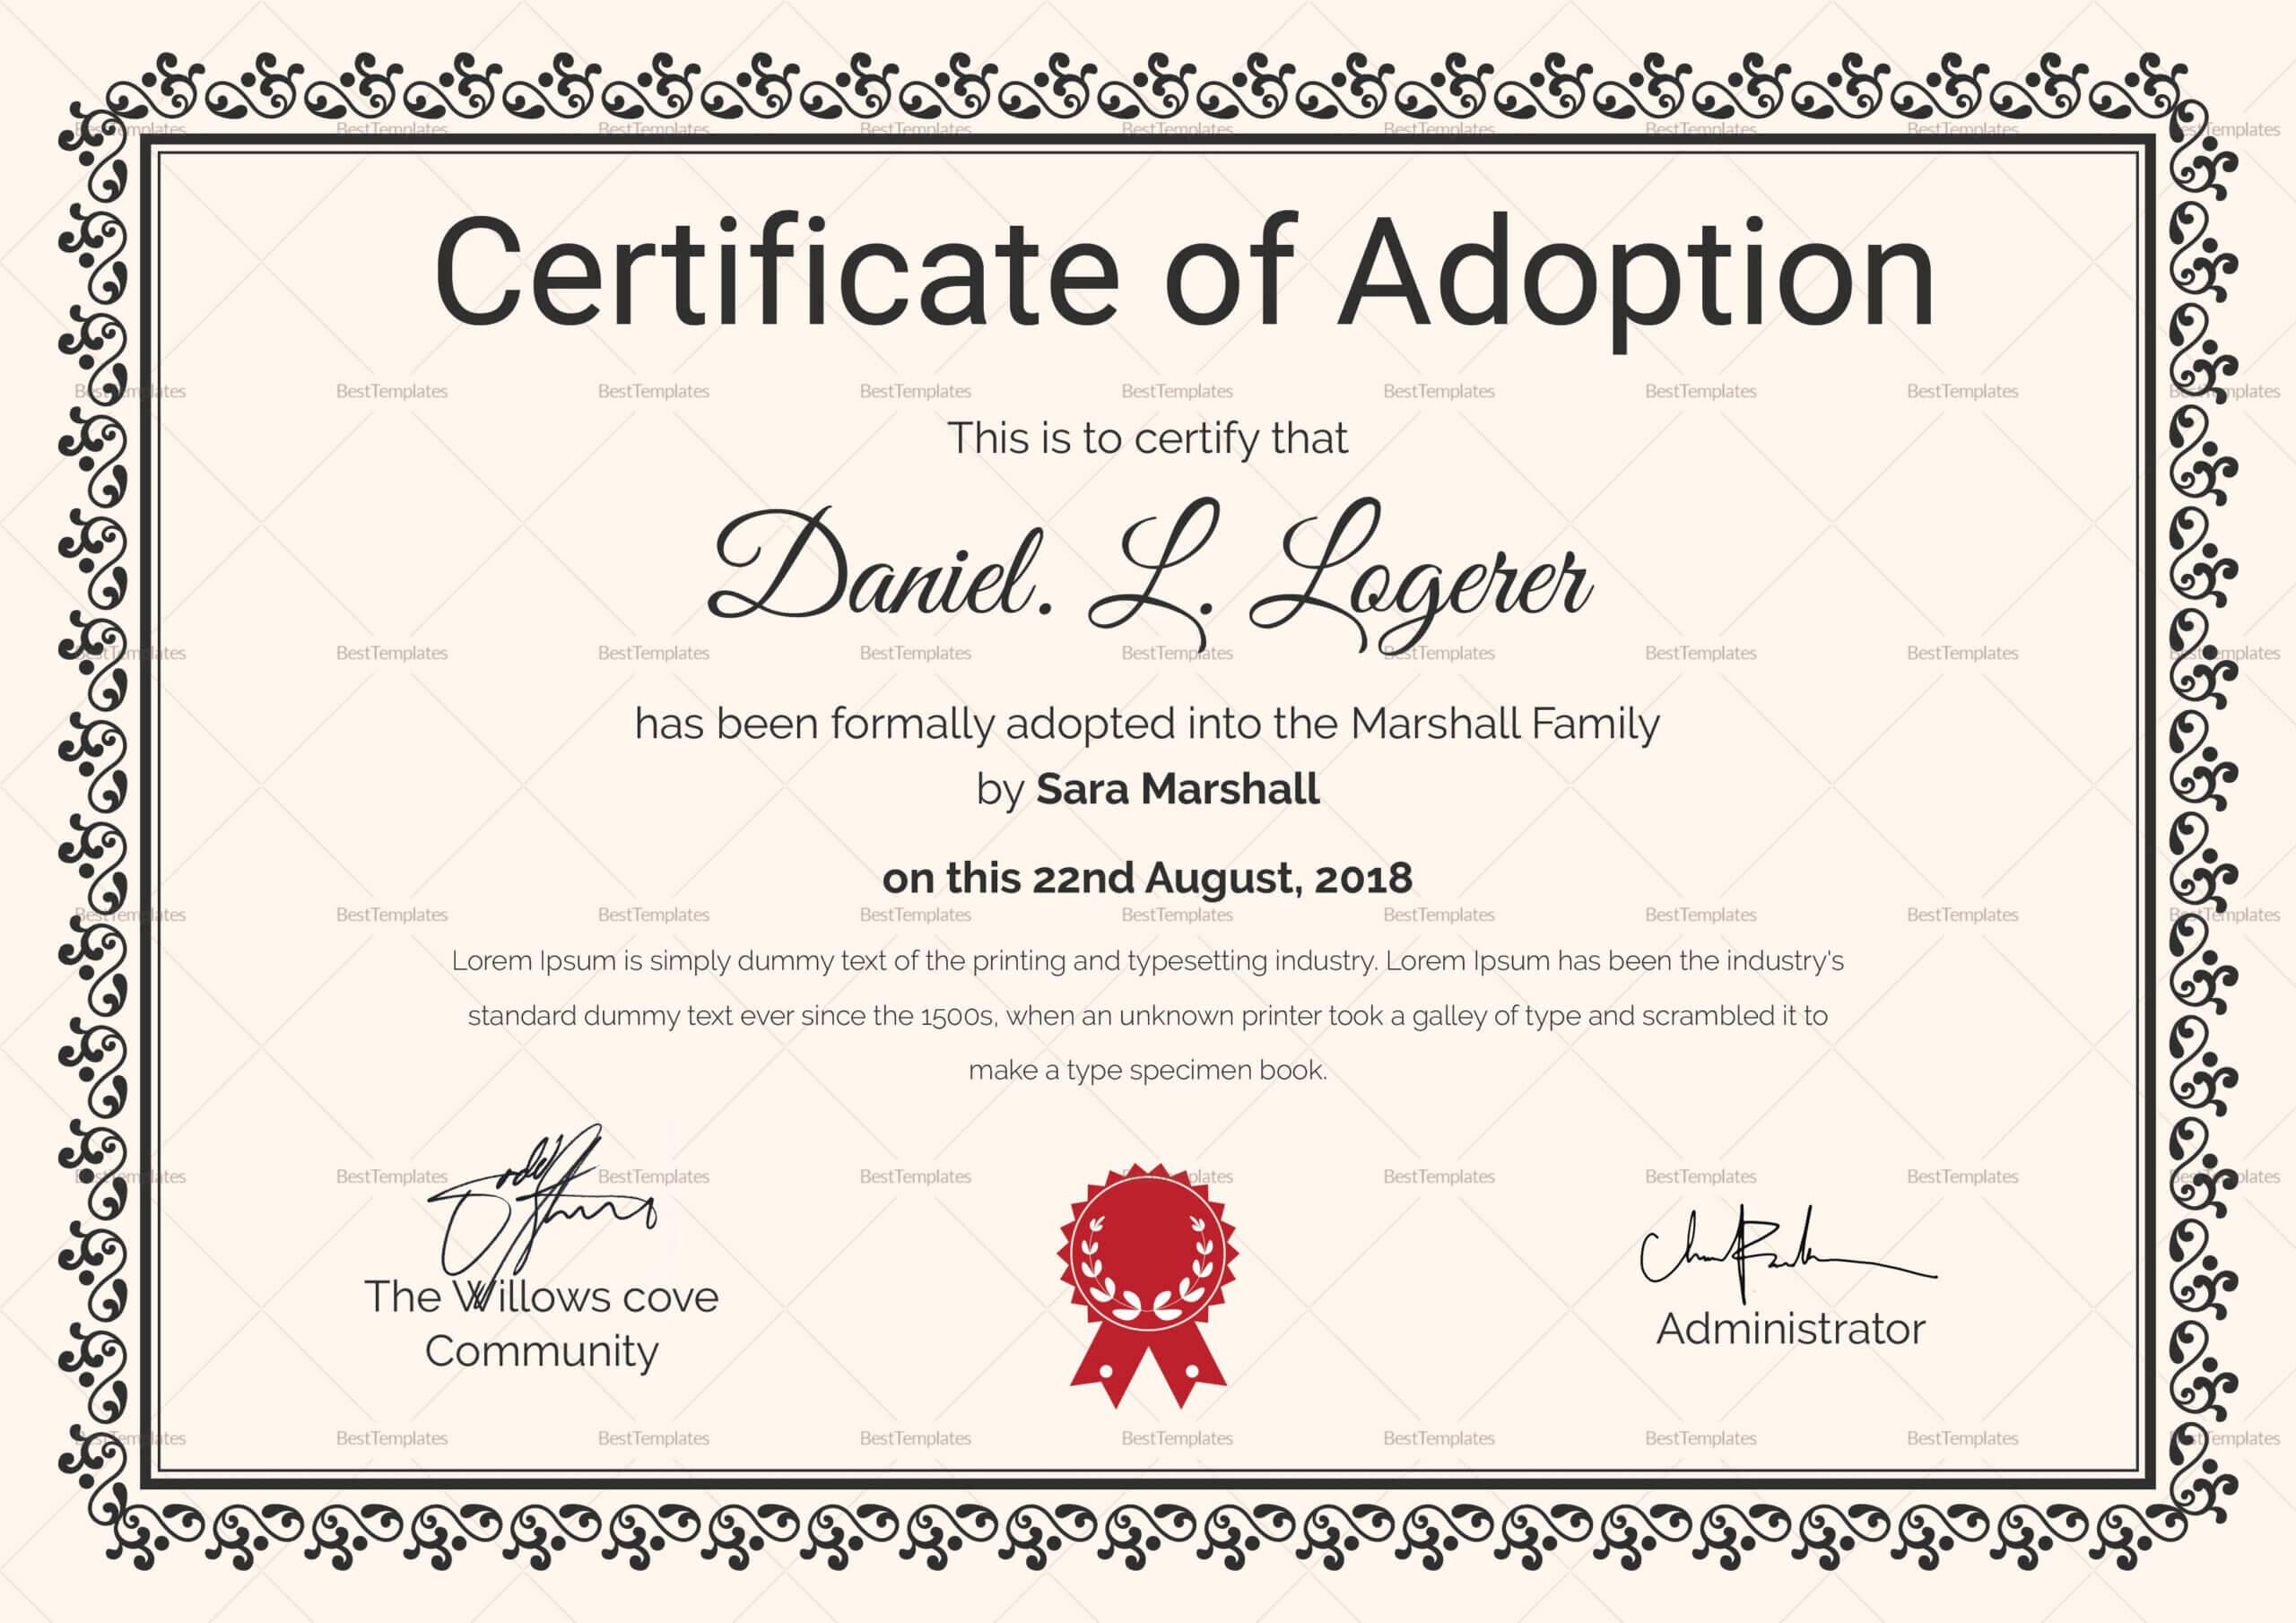 Happy Adoption Certificate Template | Adoption Certificate Intended For Adoption Certificate Template